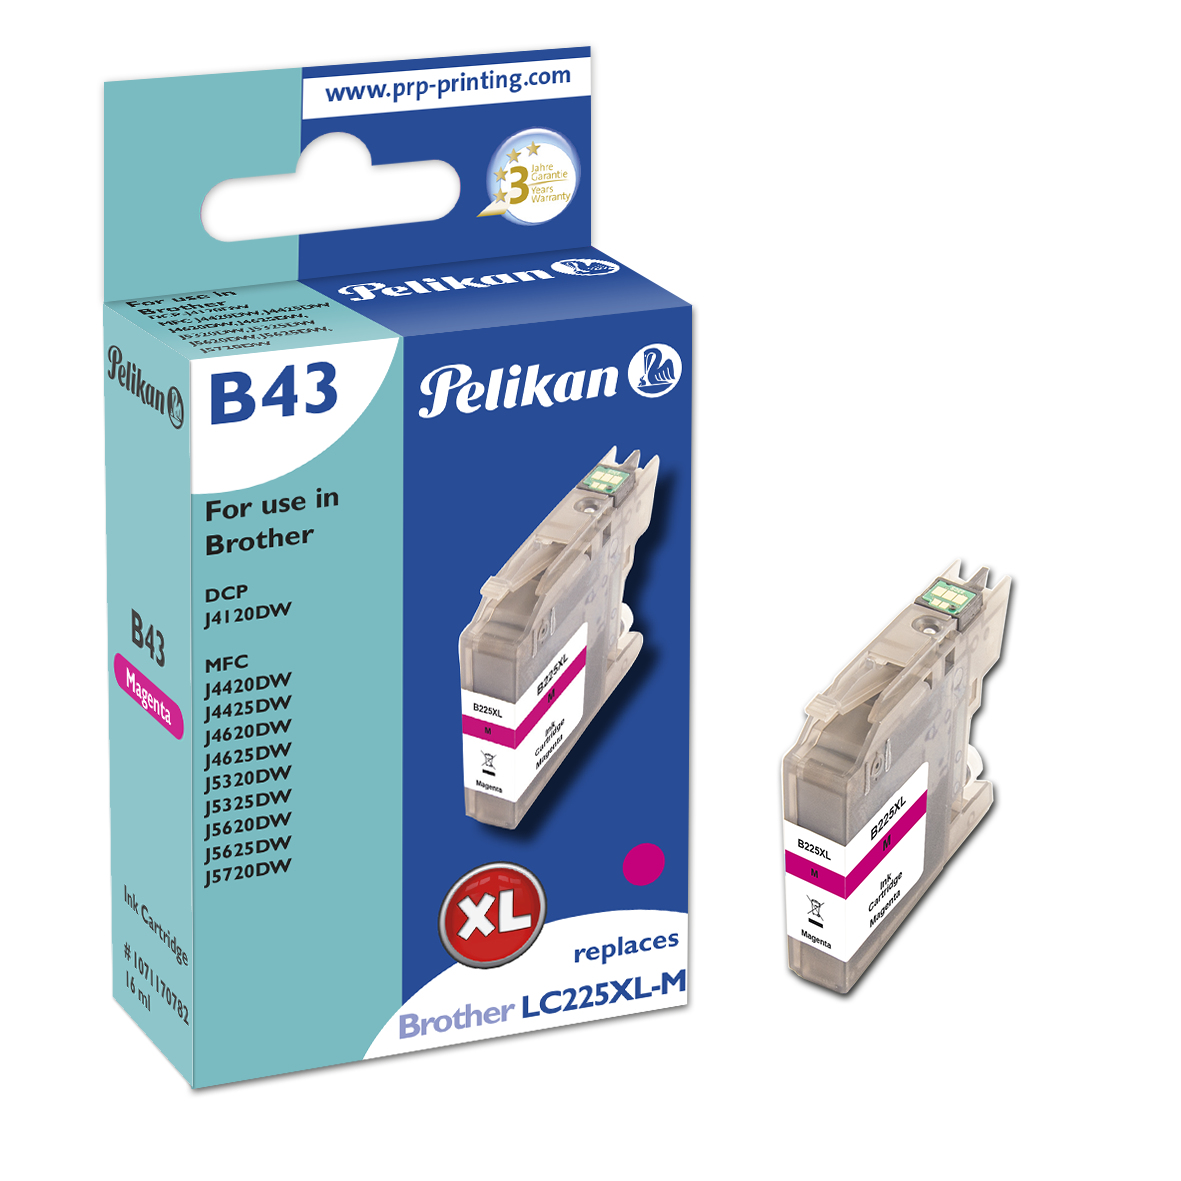 Pelikan B43 Magenta - Kompatibel - Magenta - Brother - Einzelpackung - 1 Stück(e) - 1200 Seiten